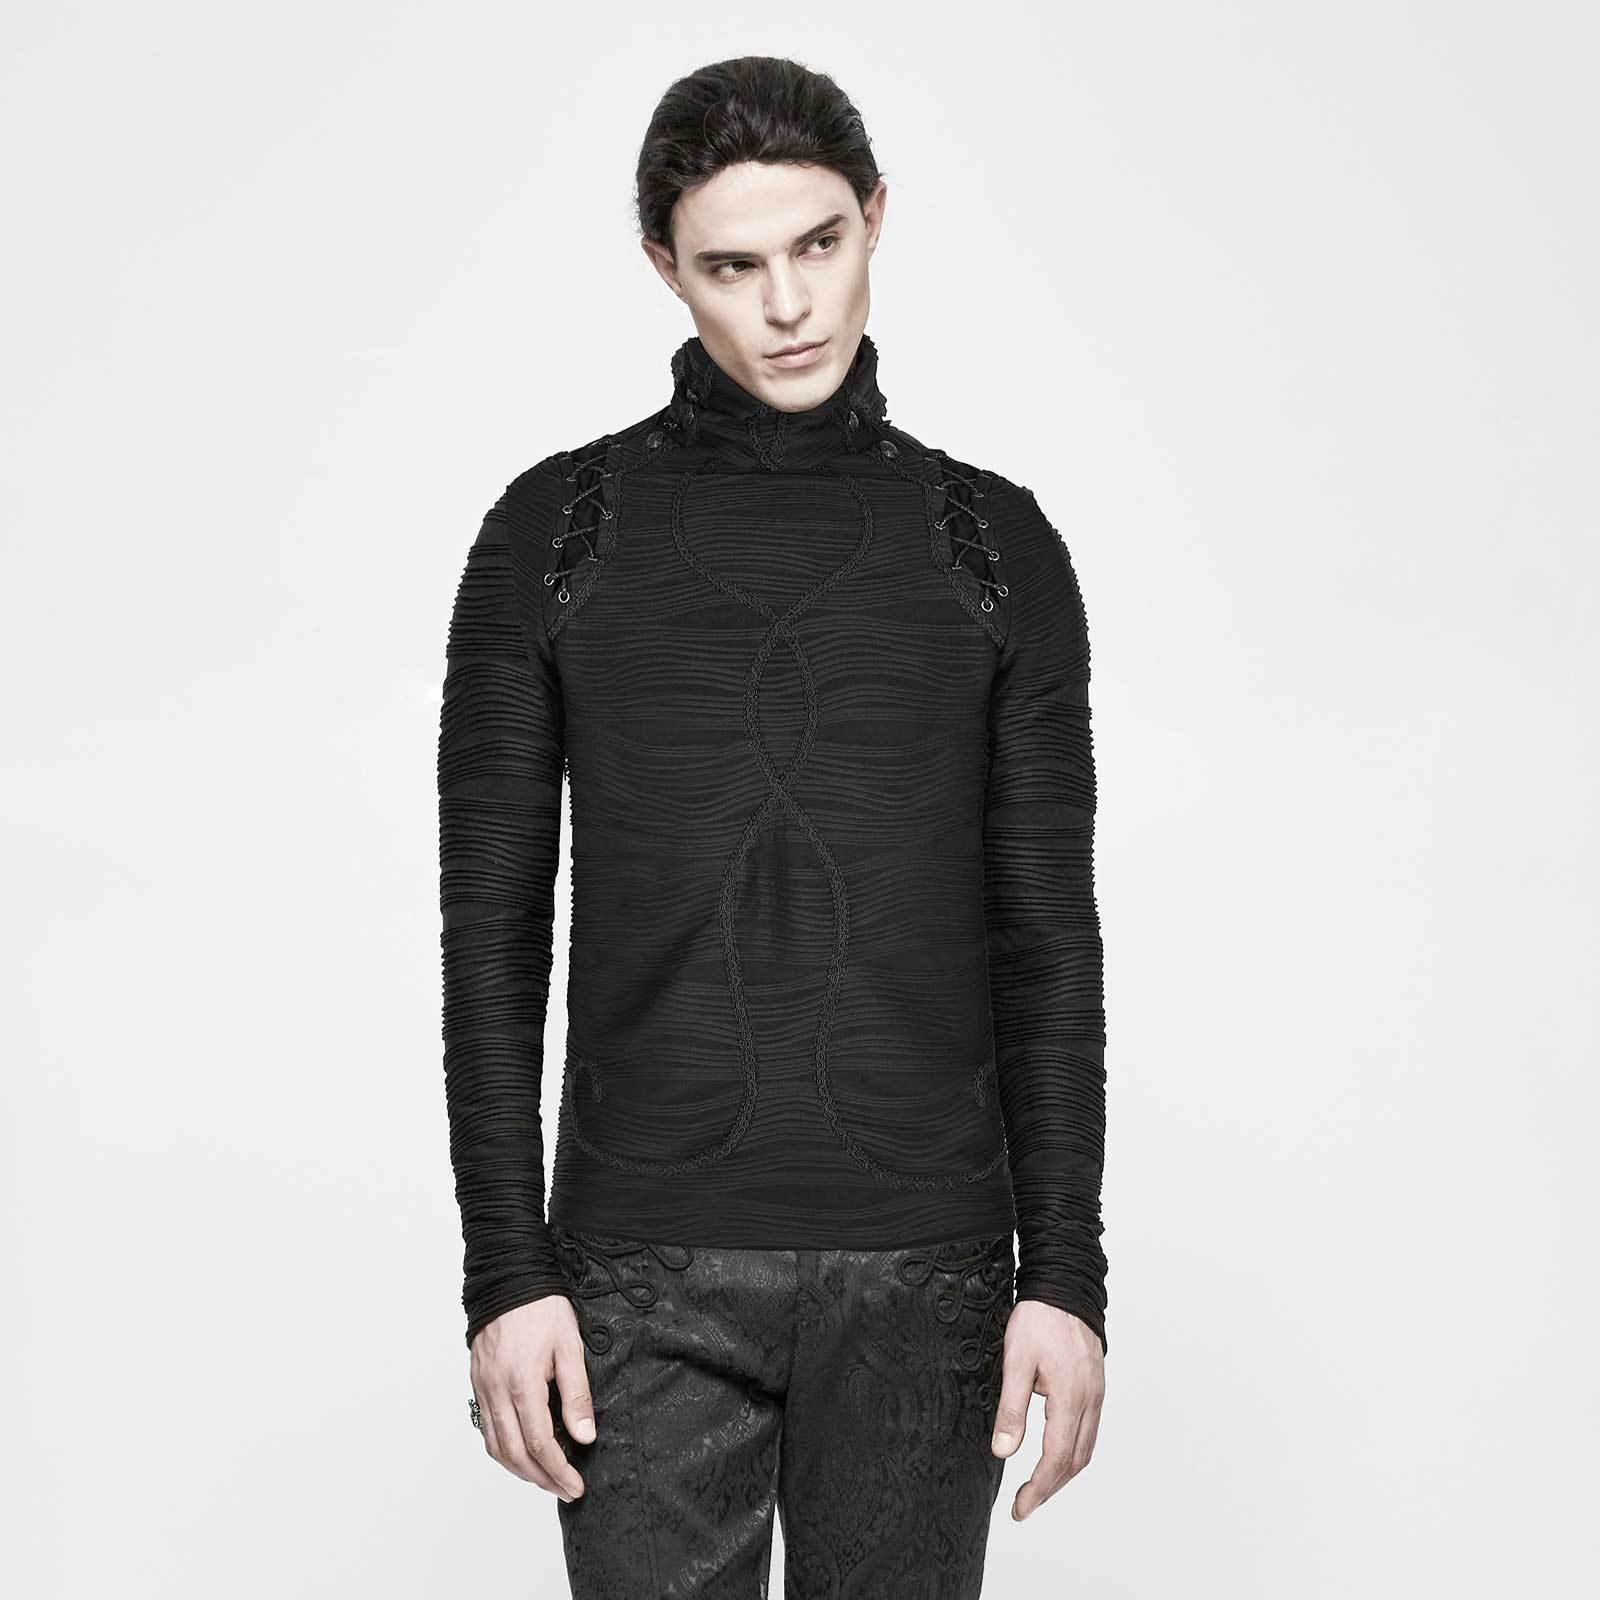 PUNK RAVE Winter Is Coming Top Ungewöhnliches Gothic Longsleeve Herren Sweater